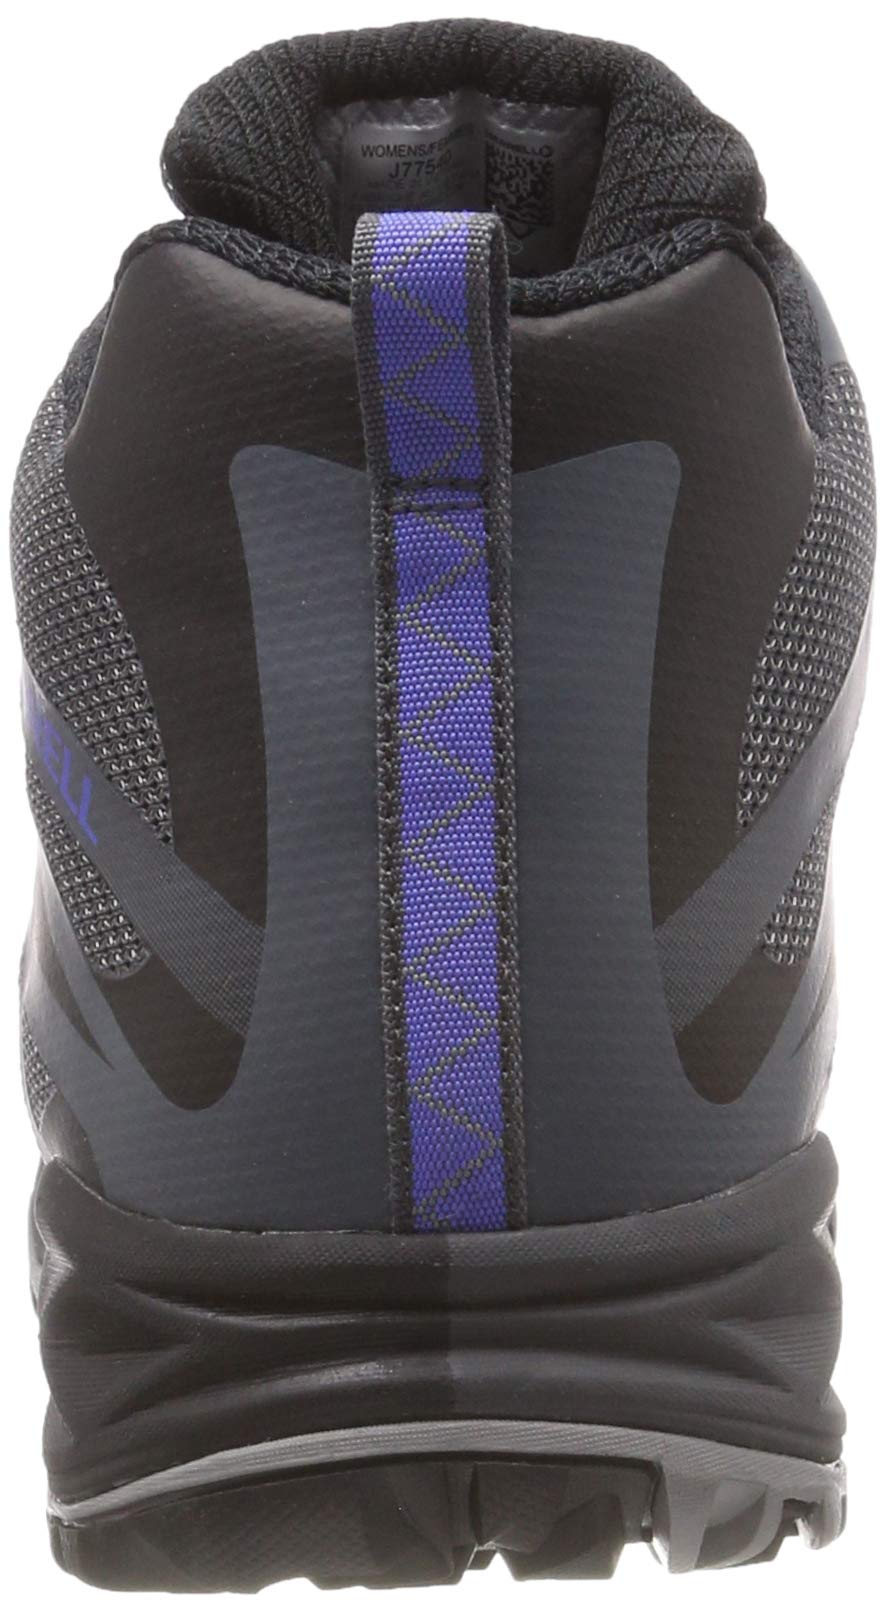 71Lo1my4mXL - Merrell Women's Siren Edge Q2 Mid Wp High Rise Hiking Boots